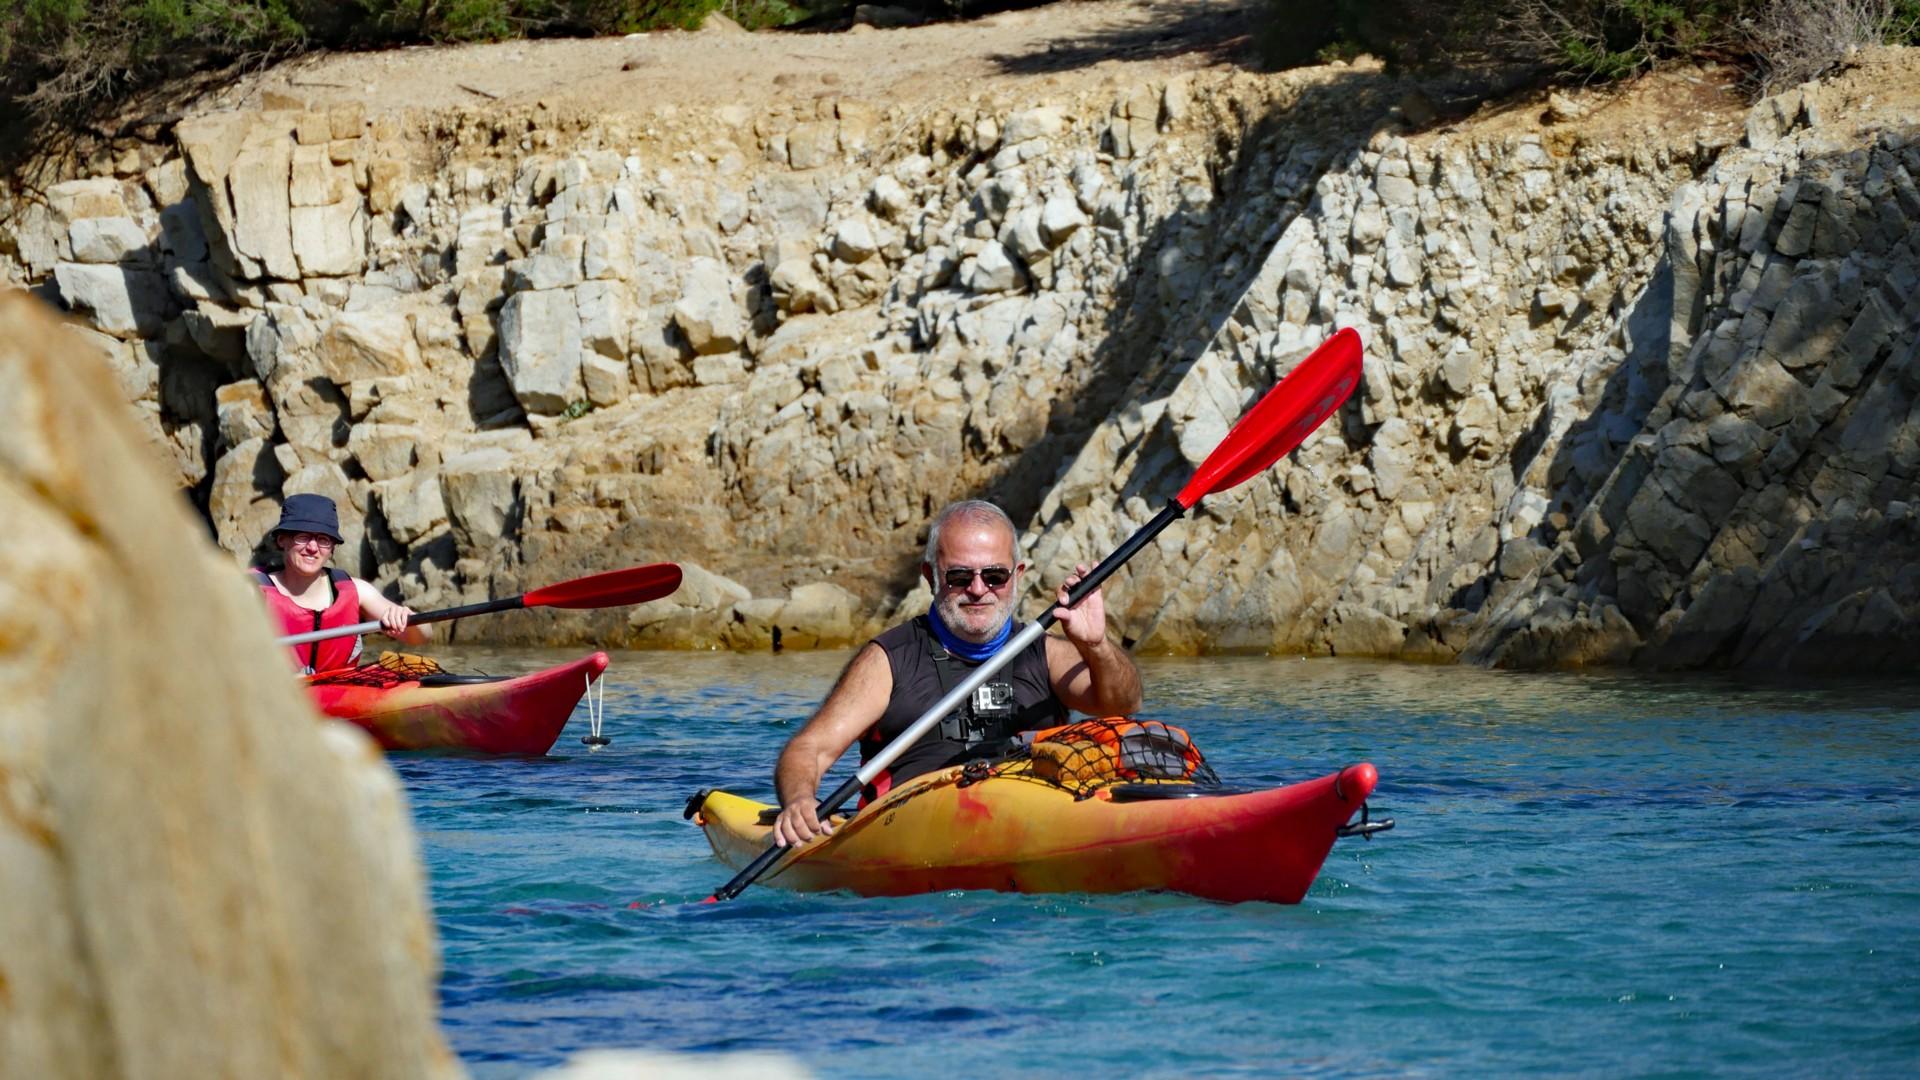 Cala Liberotto - Gavino leading the kayakers.jpg - Sardinia - Wilderness Blue Sea Kayaking - Kayaking